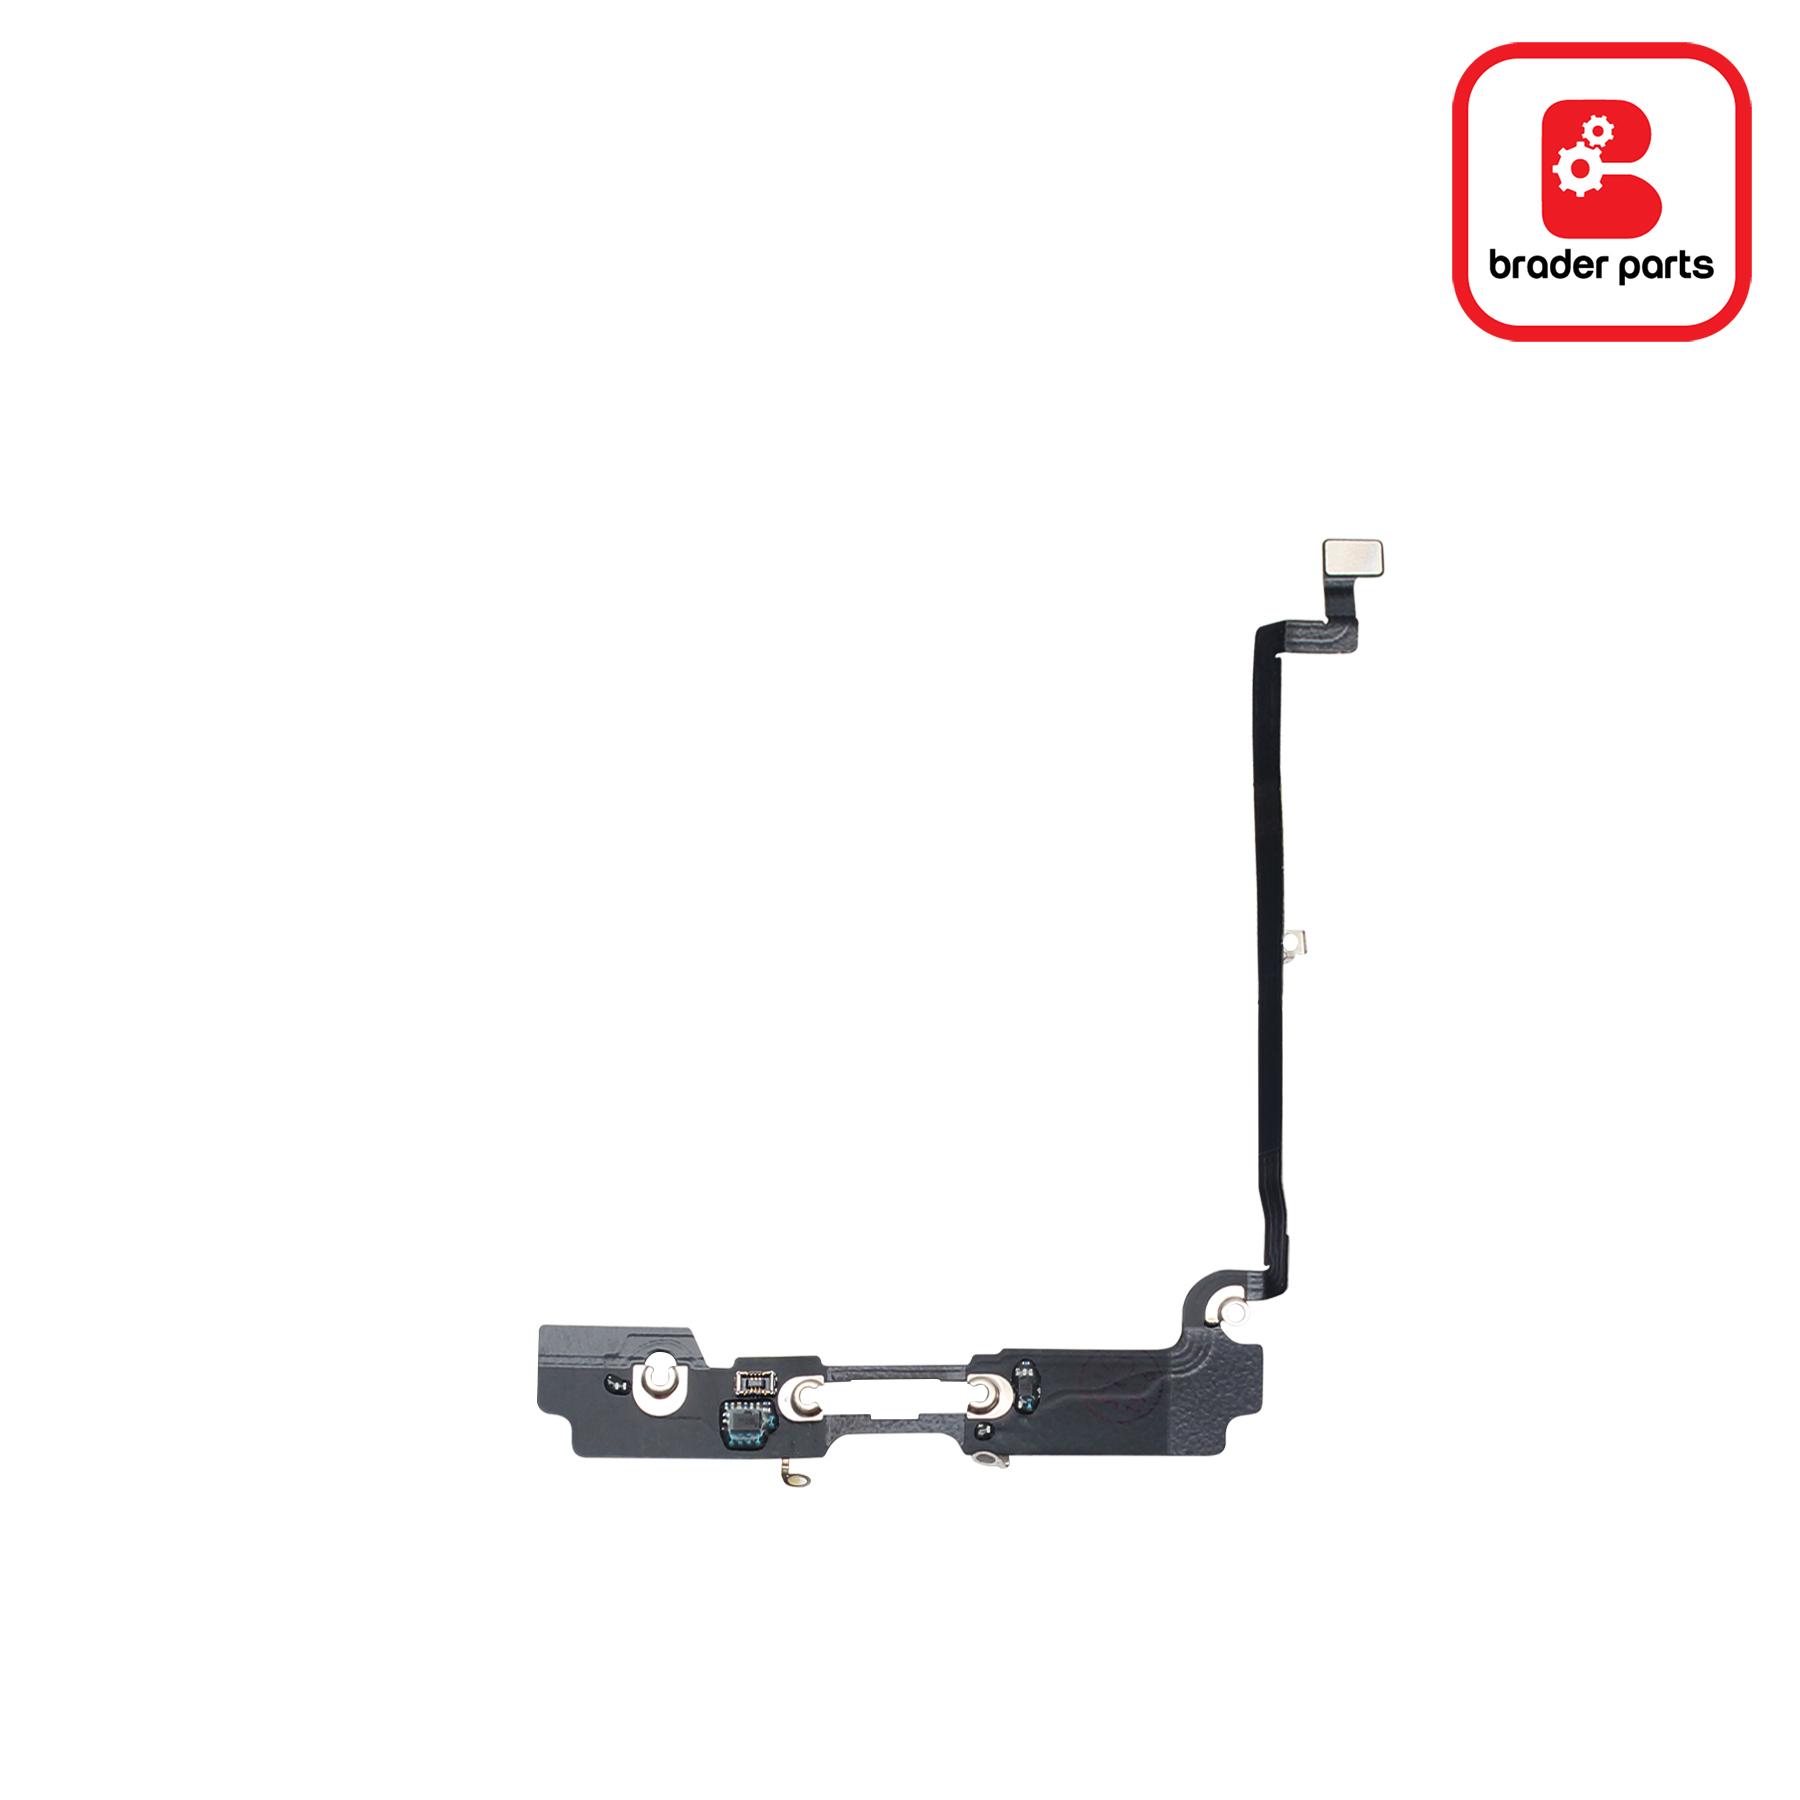 flexible antenna loudspeaker iphone x